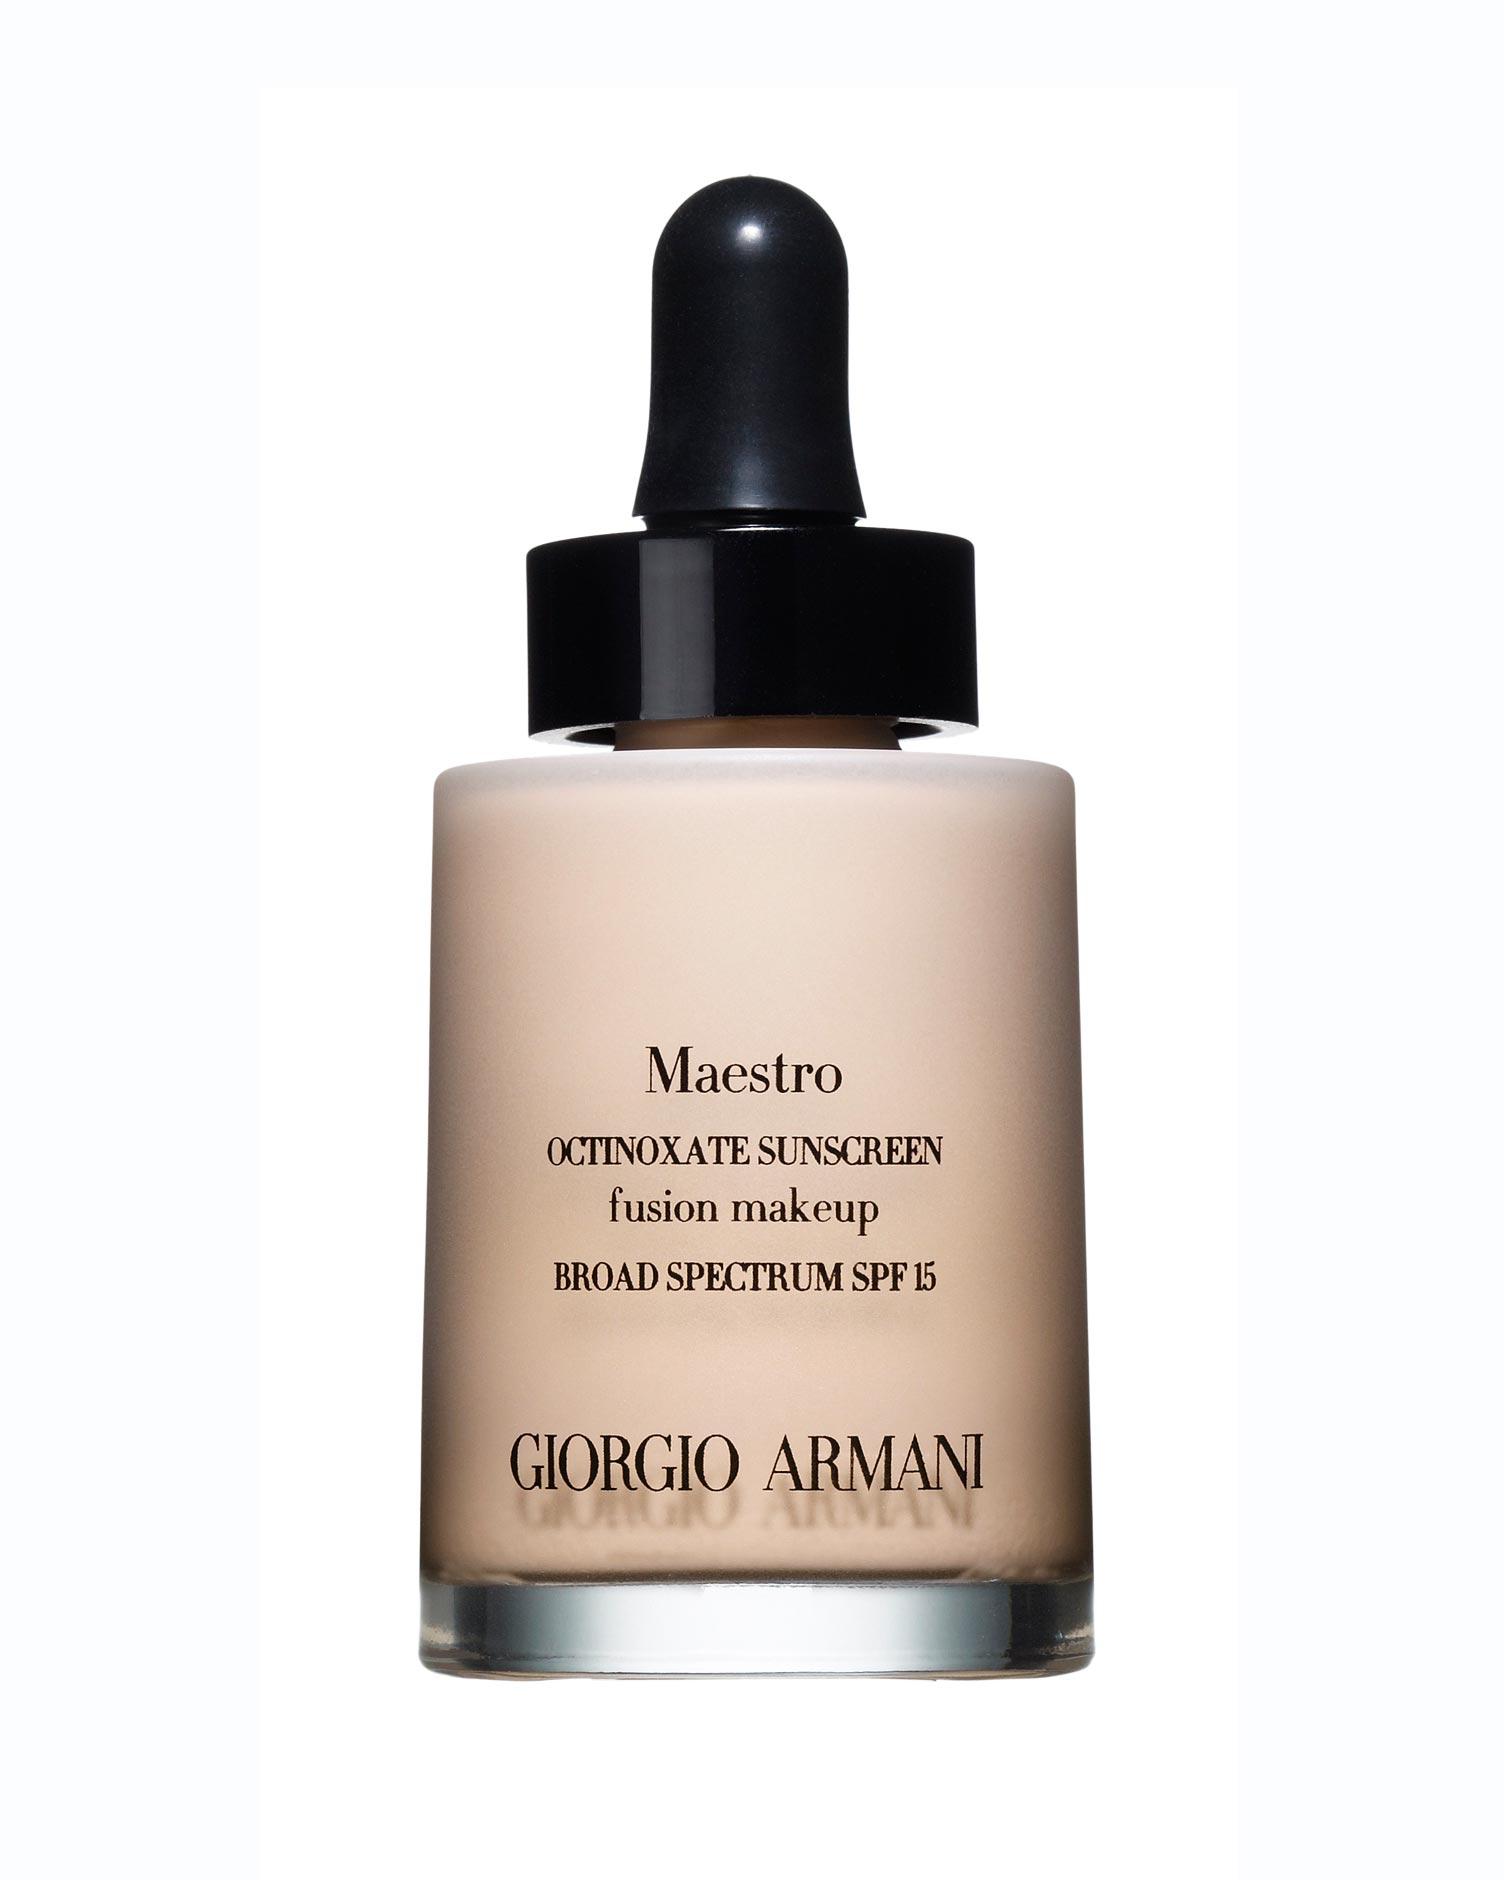 big-day-beauty-awards-giorgio-armani-maestro-fusion-makeup-0216.jpg